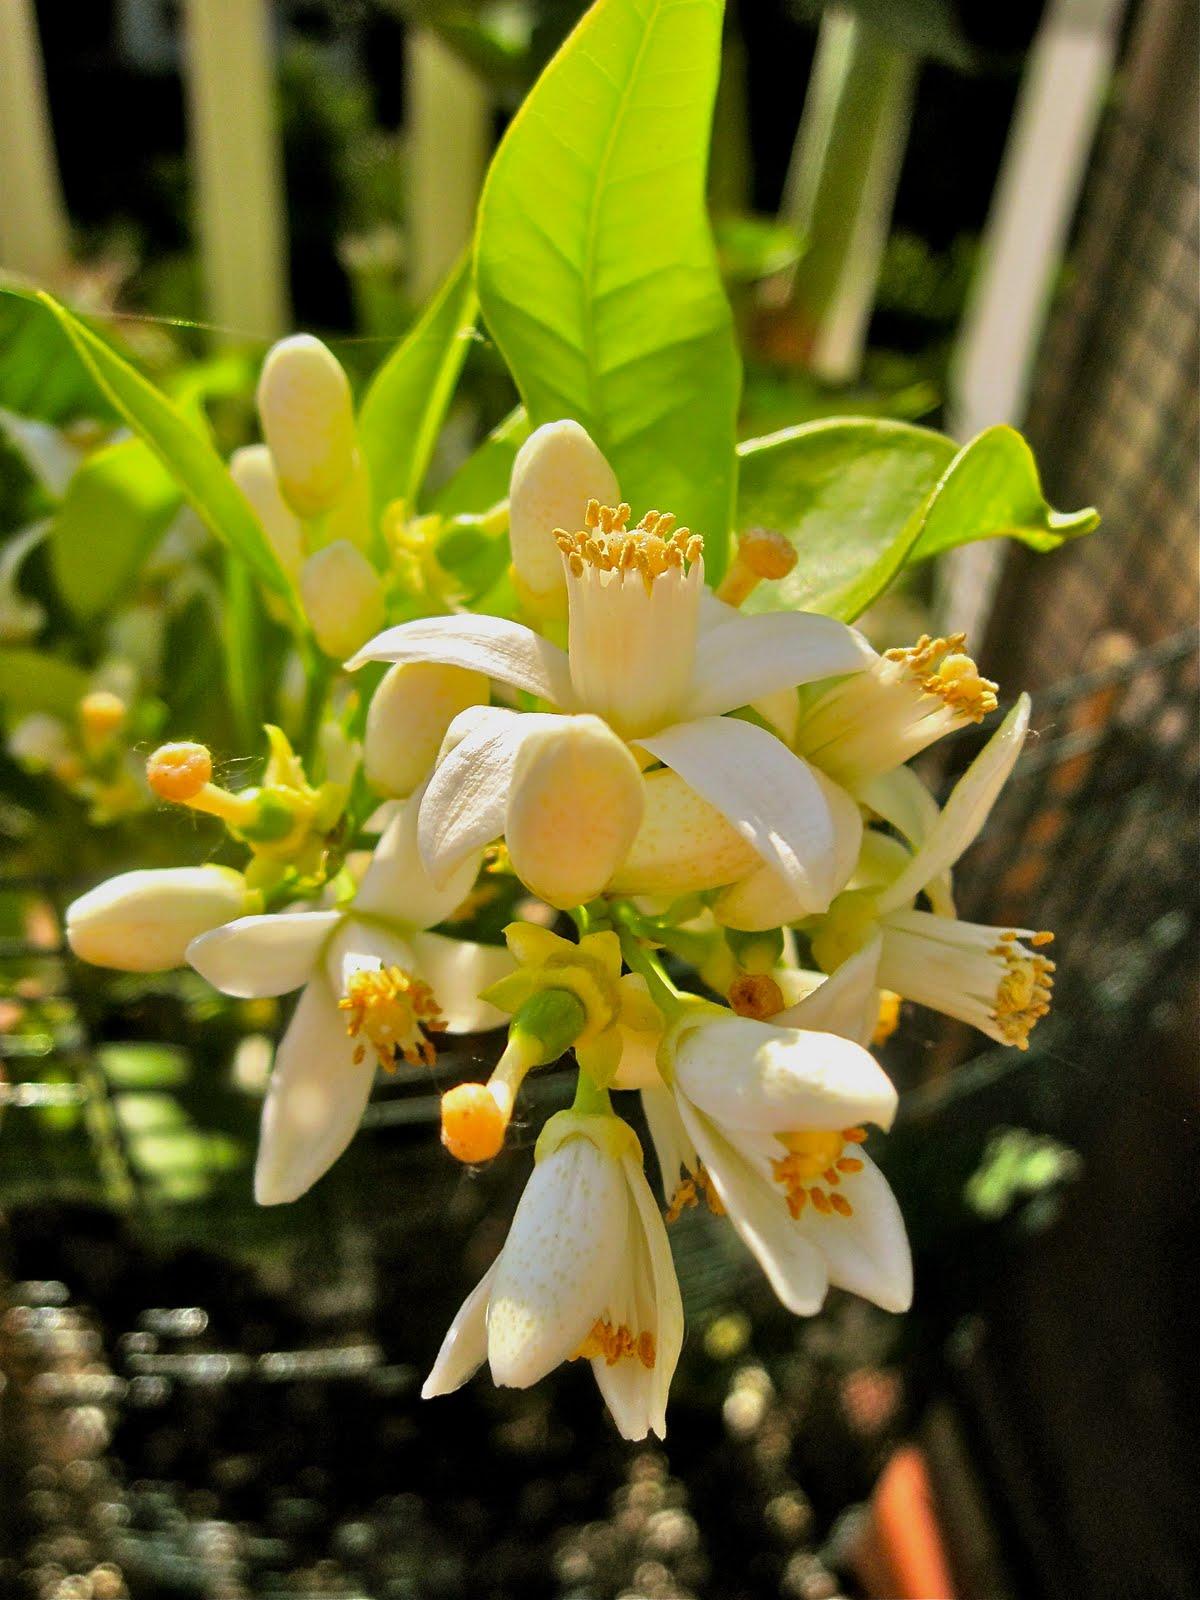 Pin Pianta-grassa-con-fiori-gialli-img-1675jpg on Pinterest